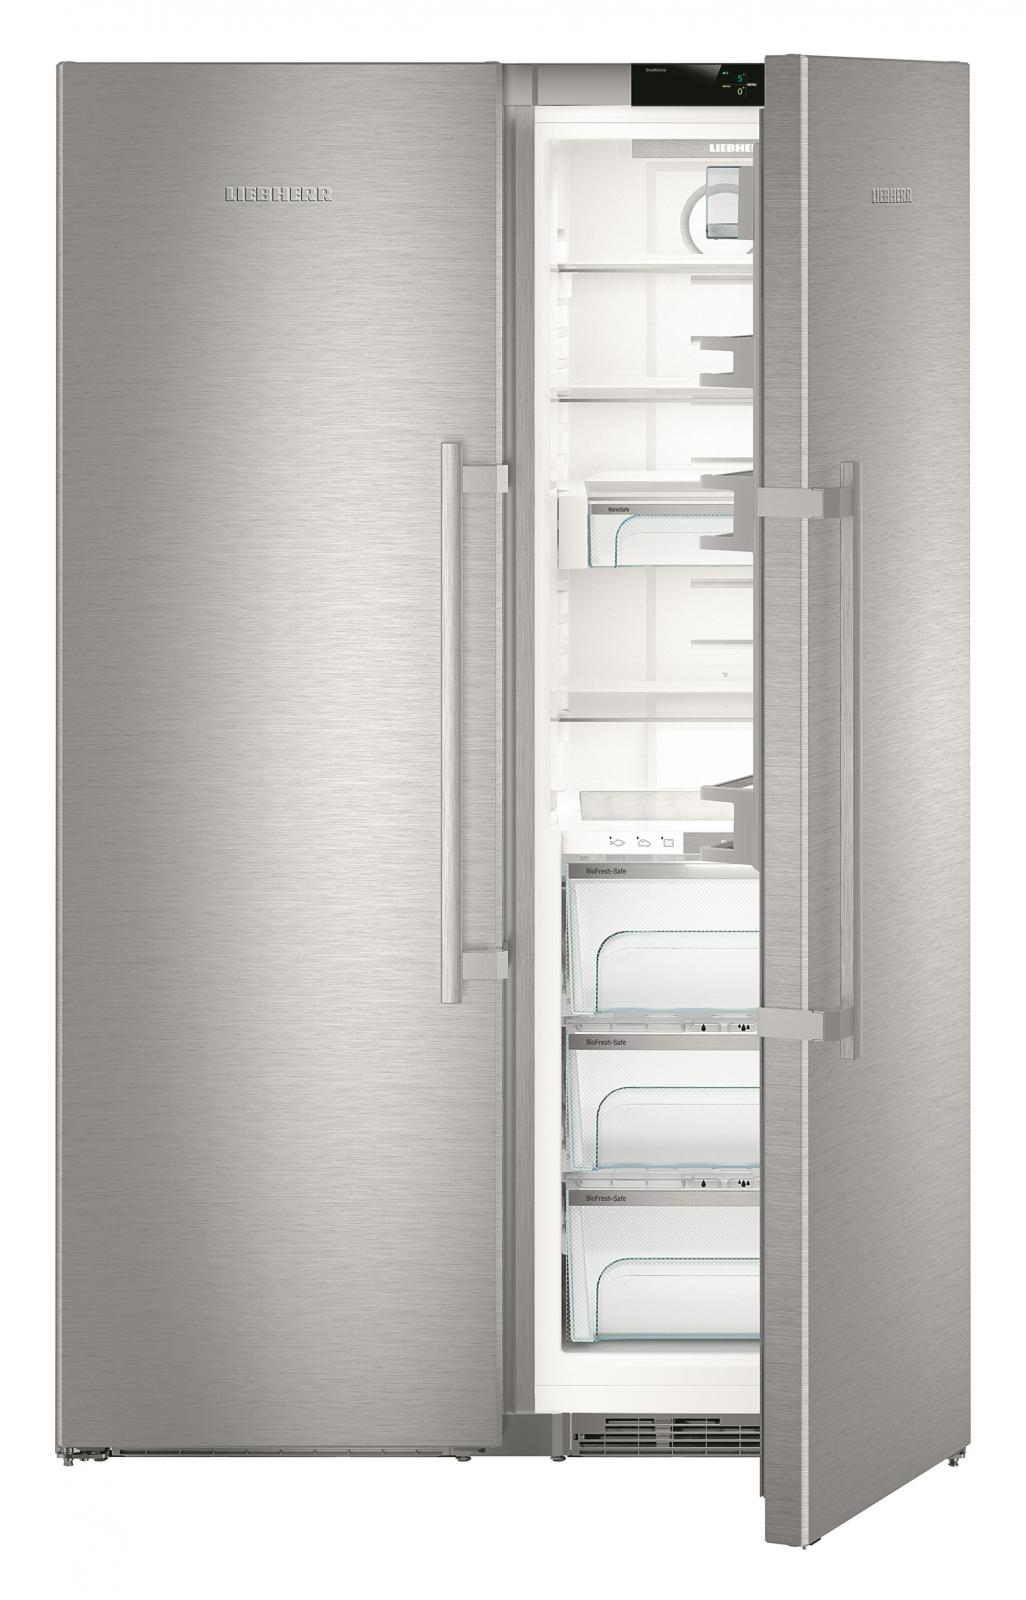 купить Side-by-Side холодильник Liebherr SBSes 8663 Украина фото 6